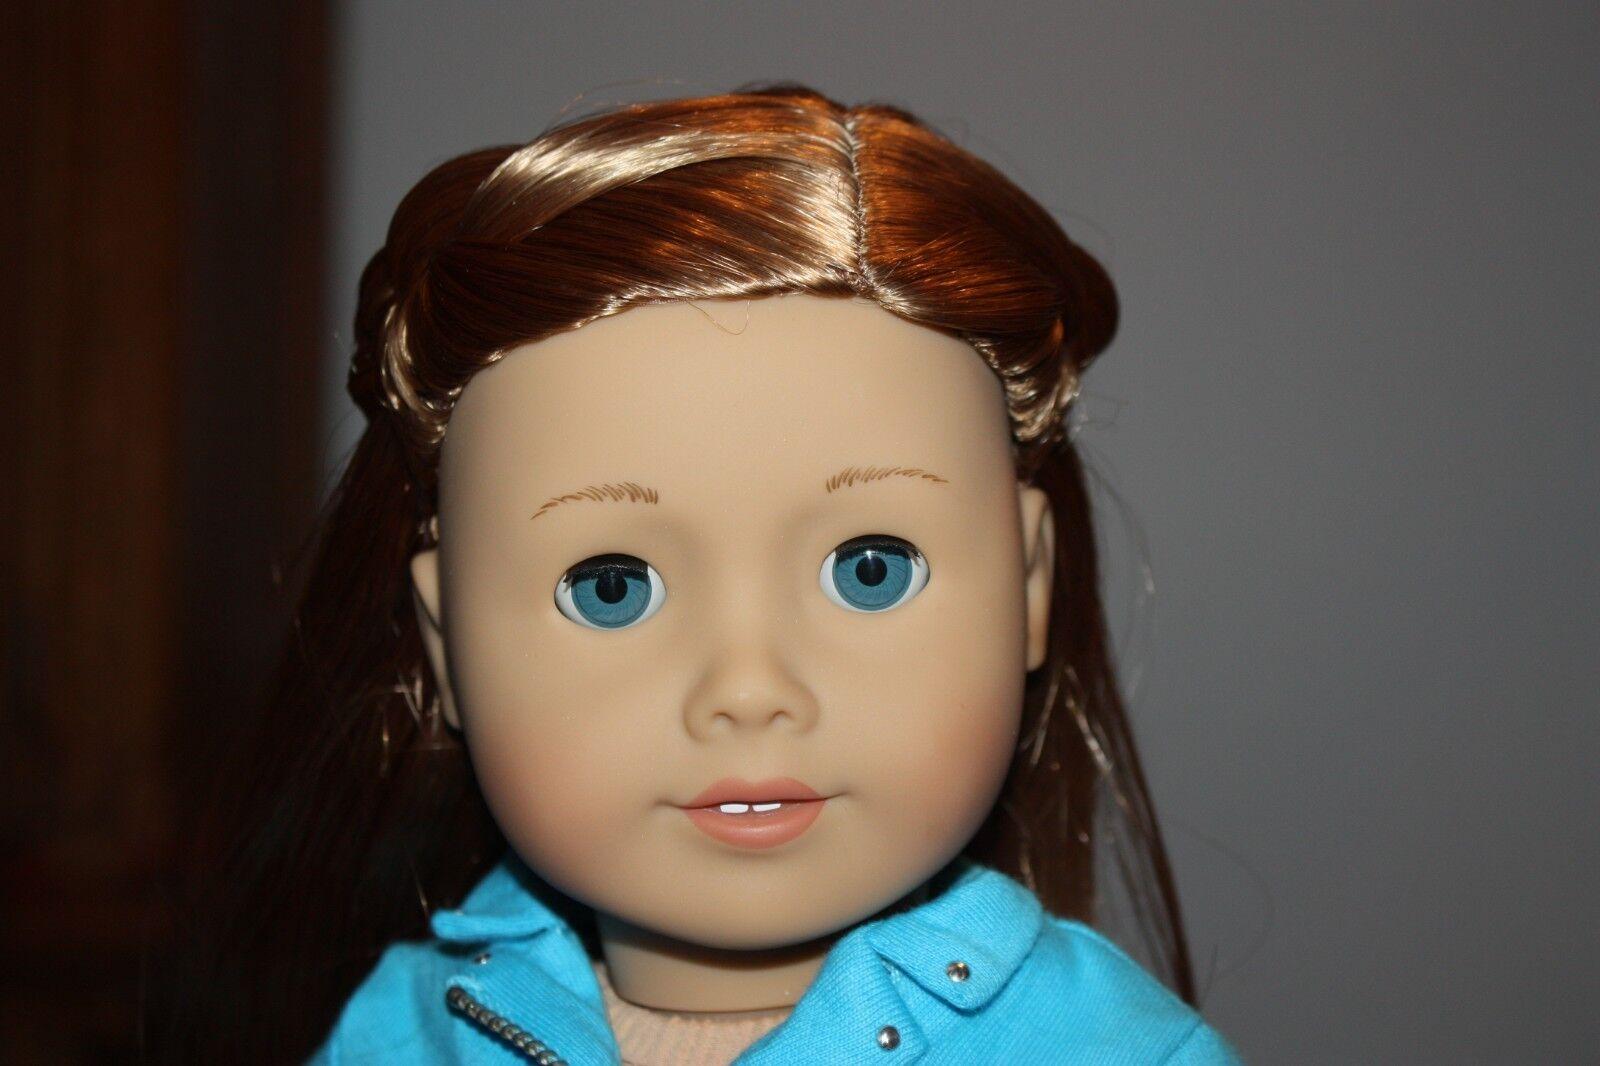 Nuevo American Girl realmente me 18  Muñeca LT Piel Ojos Azules Pelo Estilo Caramelo